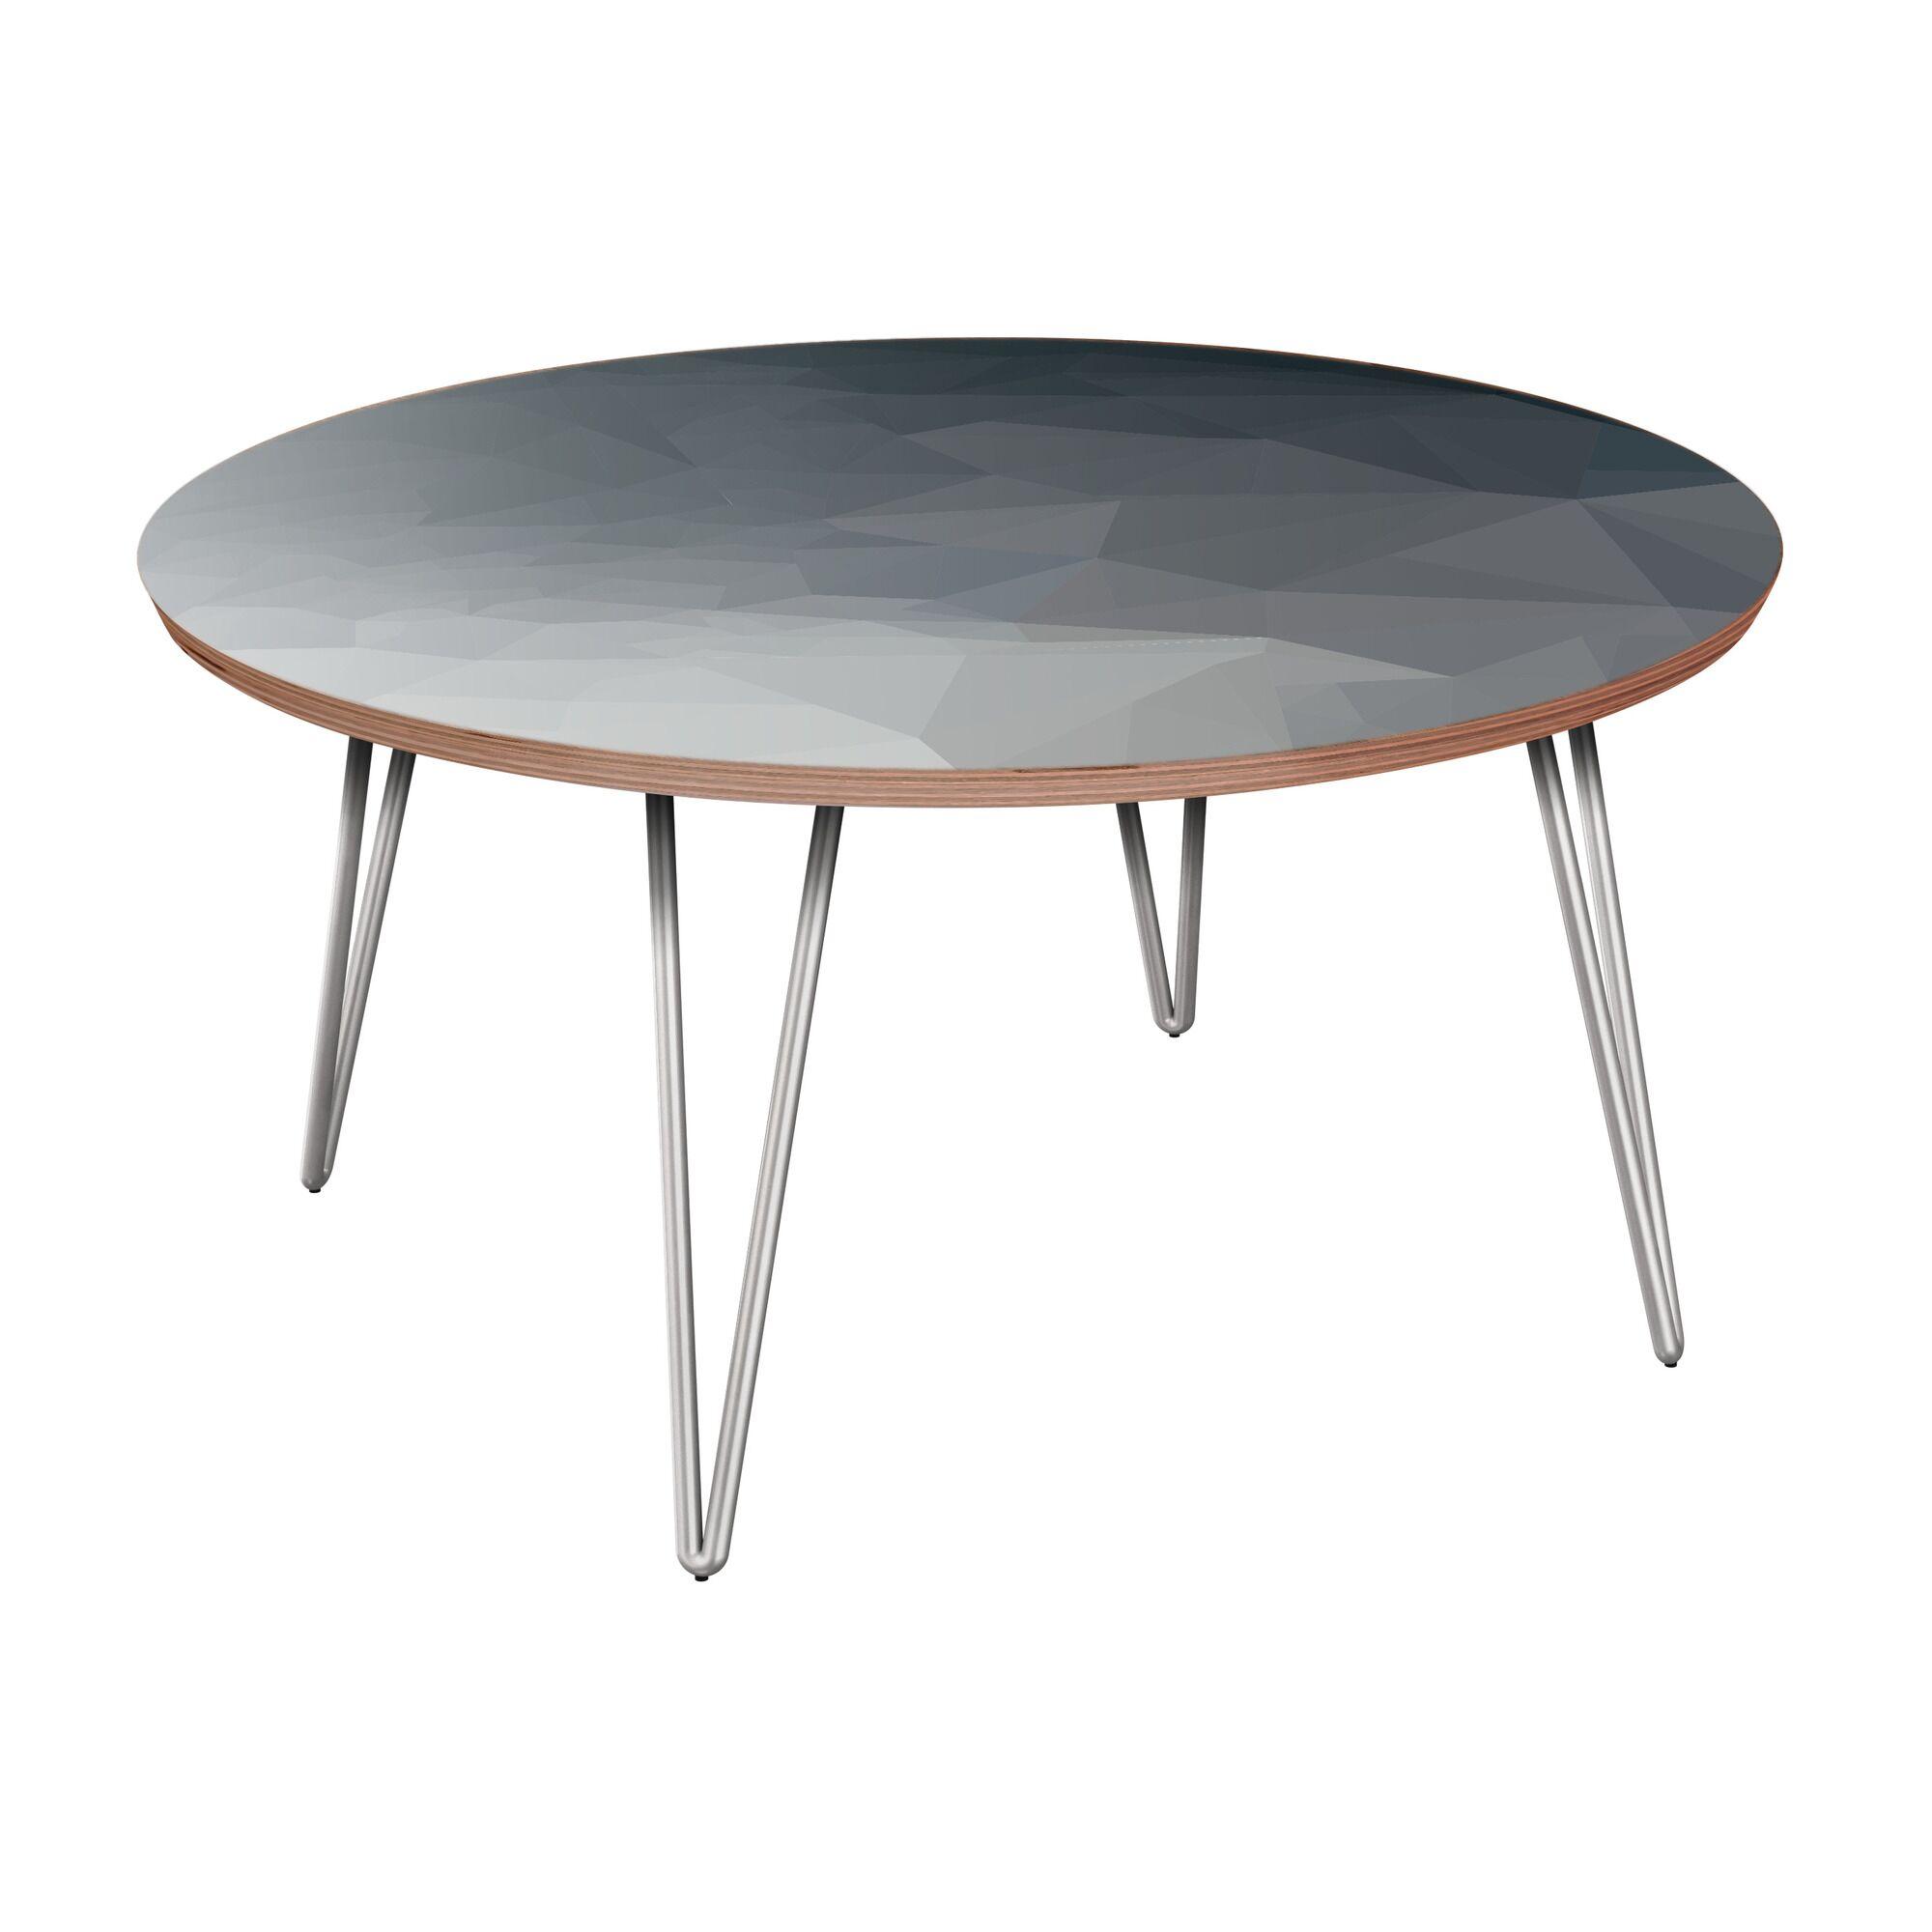 Herdon Coffee Table Table Base Color: Chrome, Table Top Boarder Color: Walnut, Table Top Color: Gray/Black